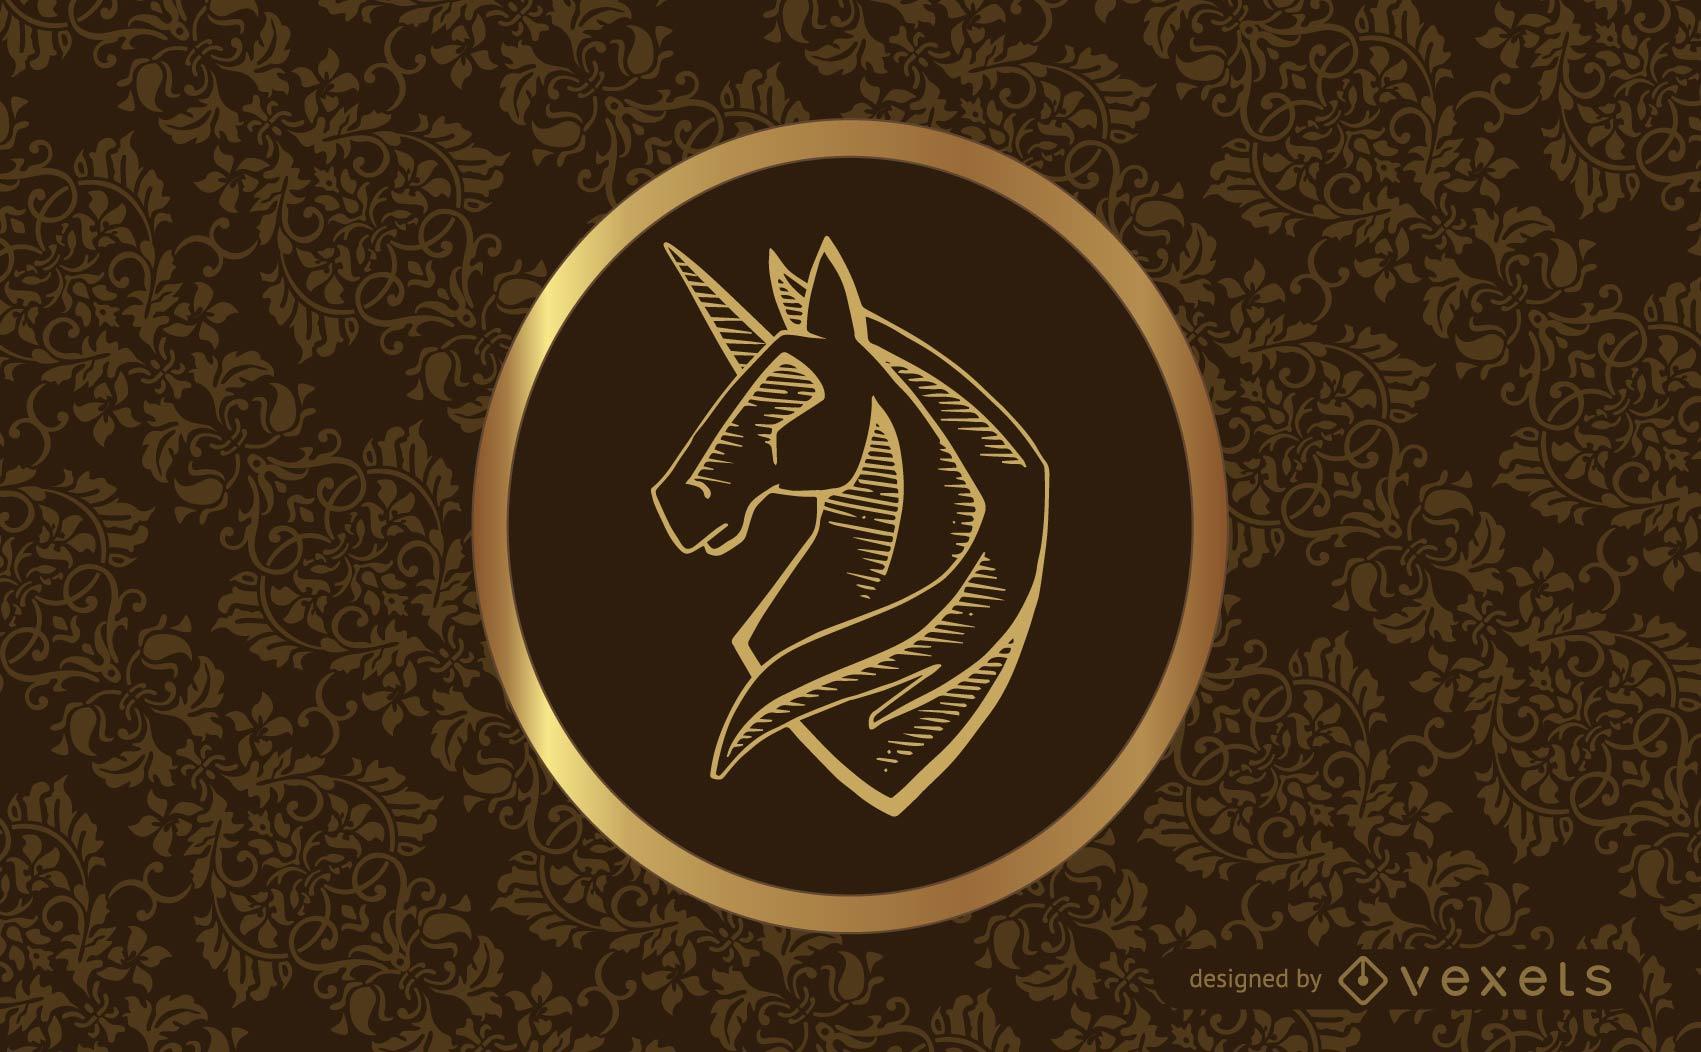 Vintage classic design with swirls and unicorn